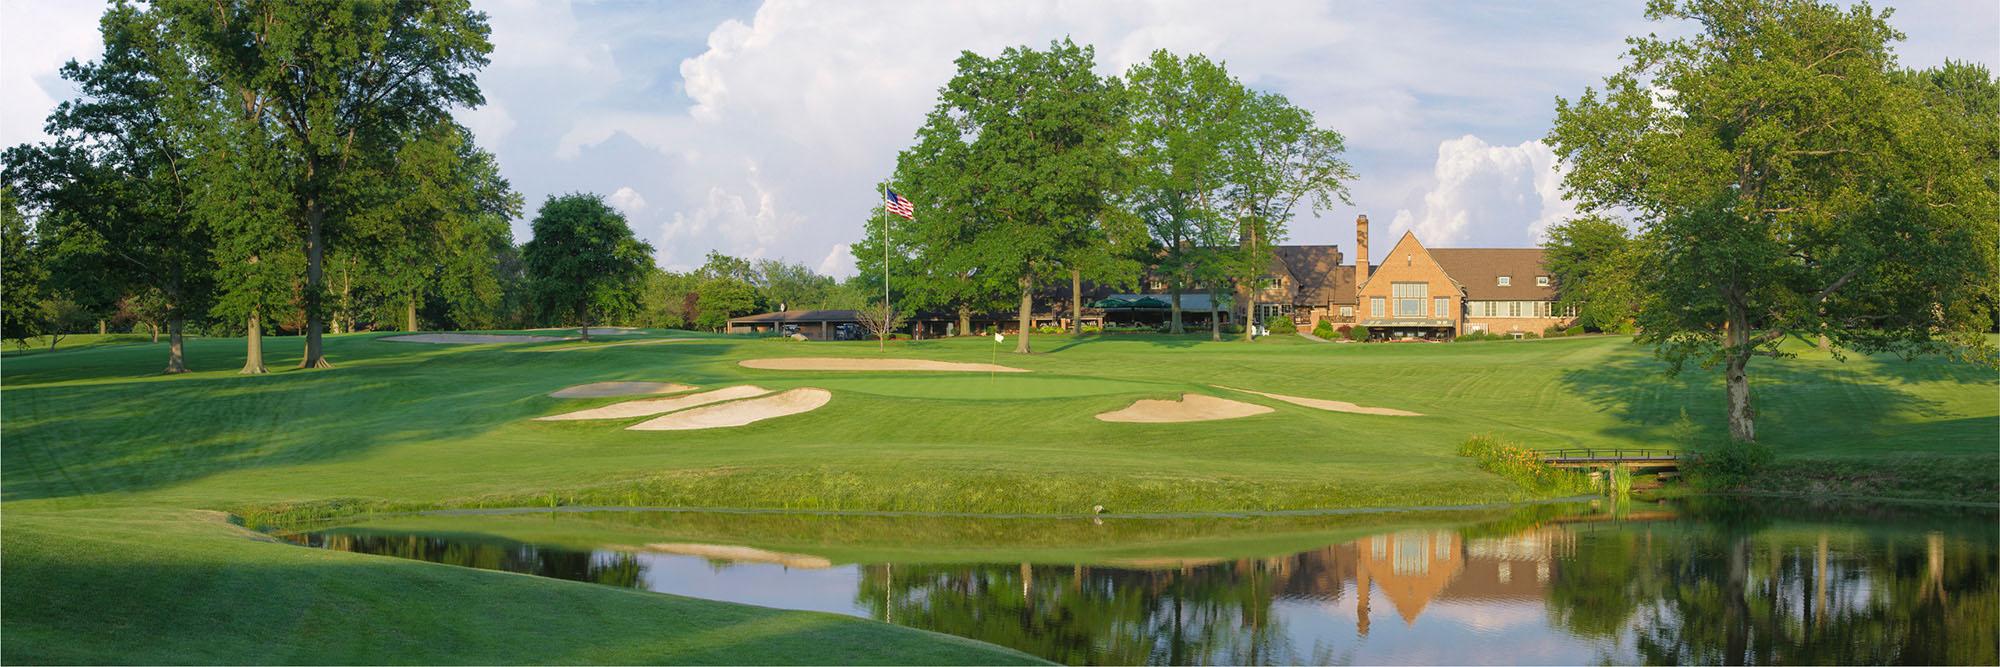 Golf Course Image - Canterbury No. 3